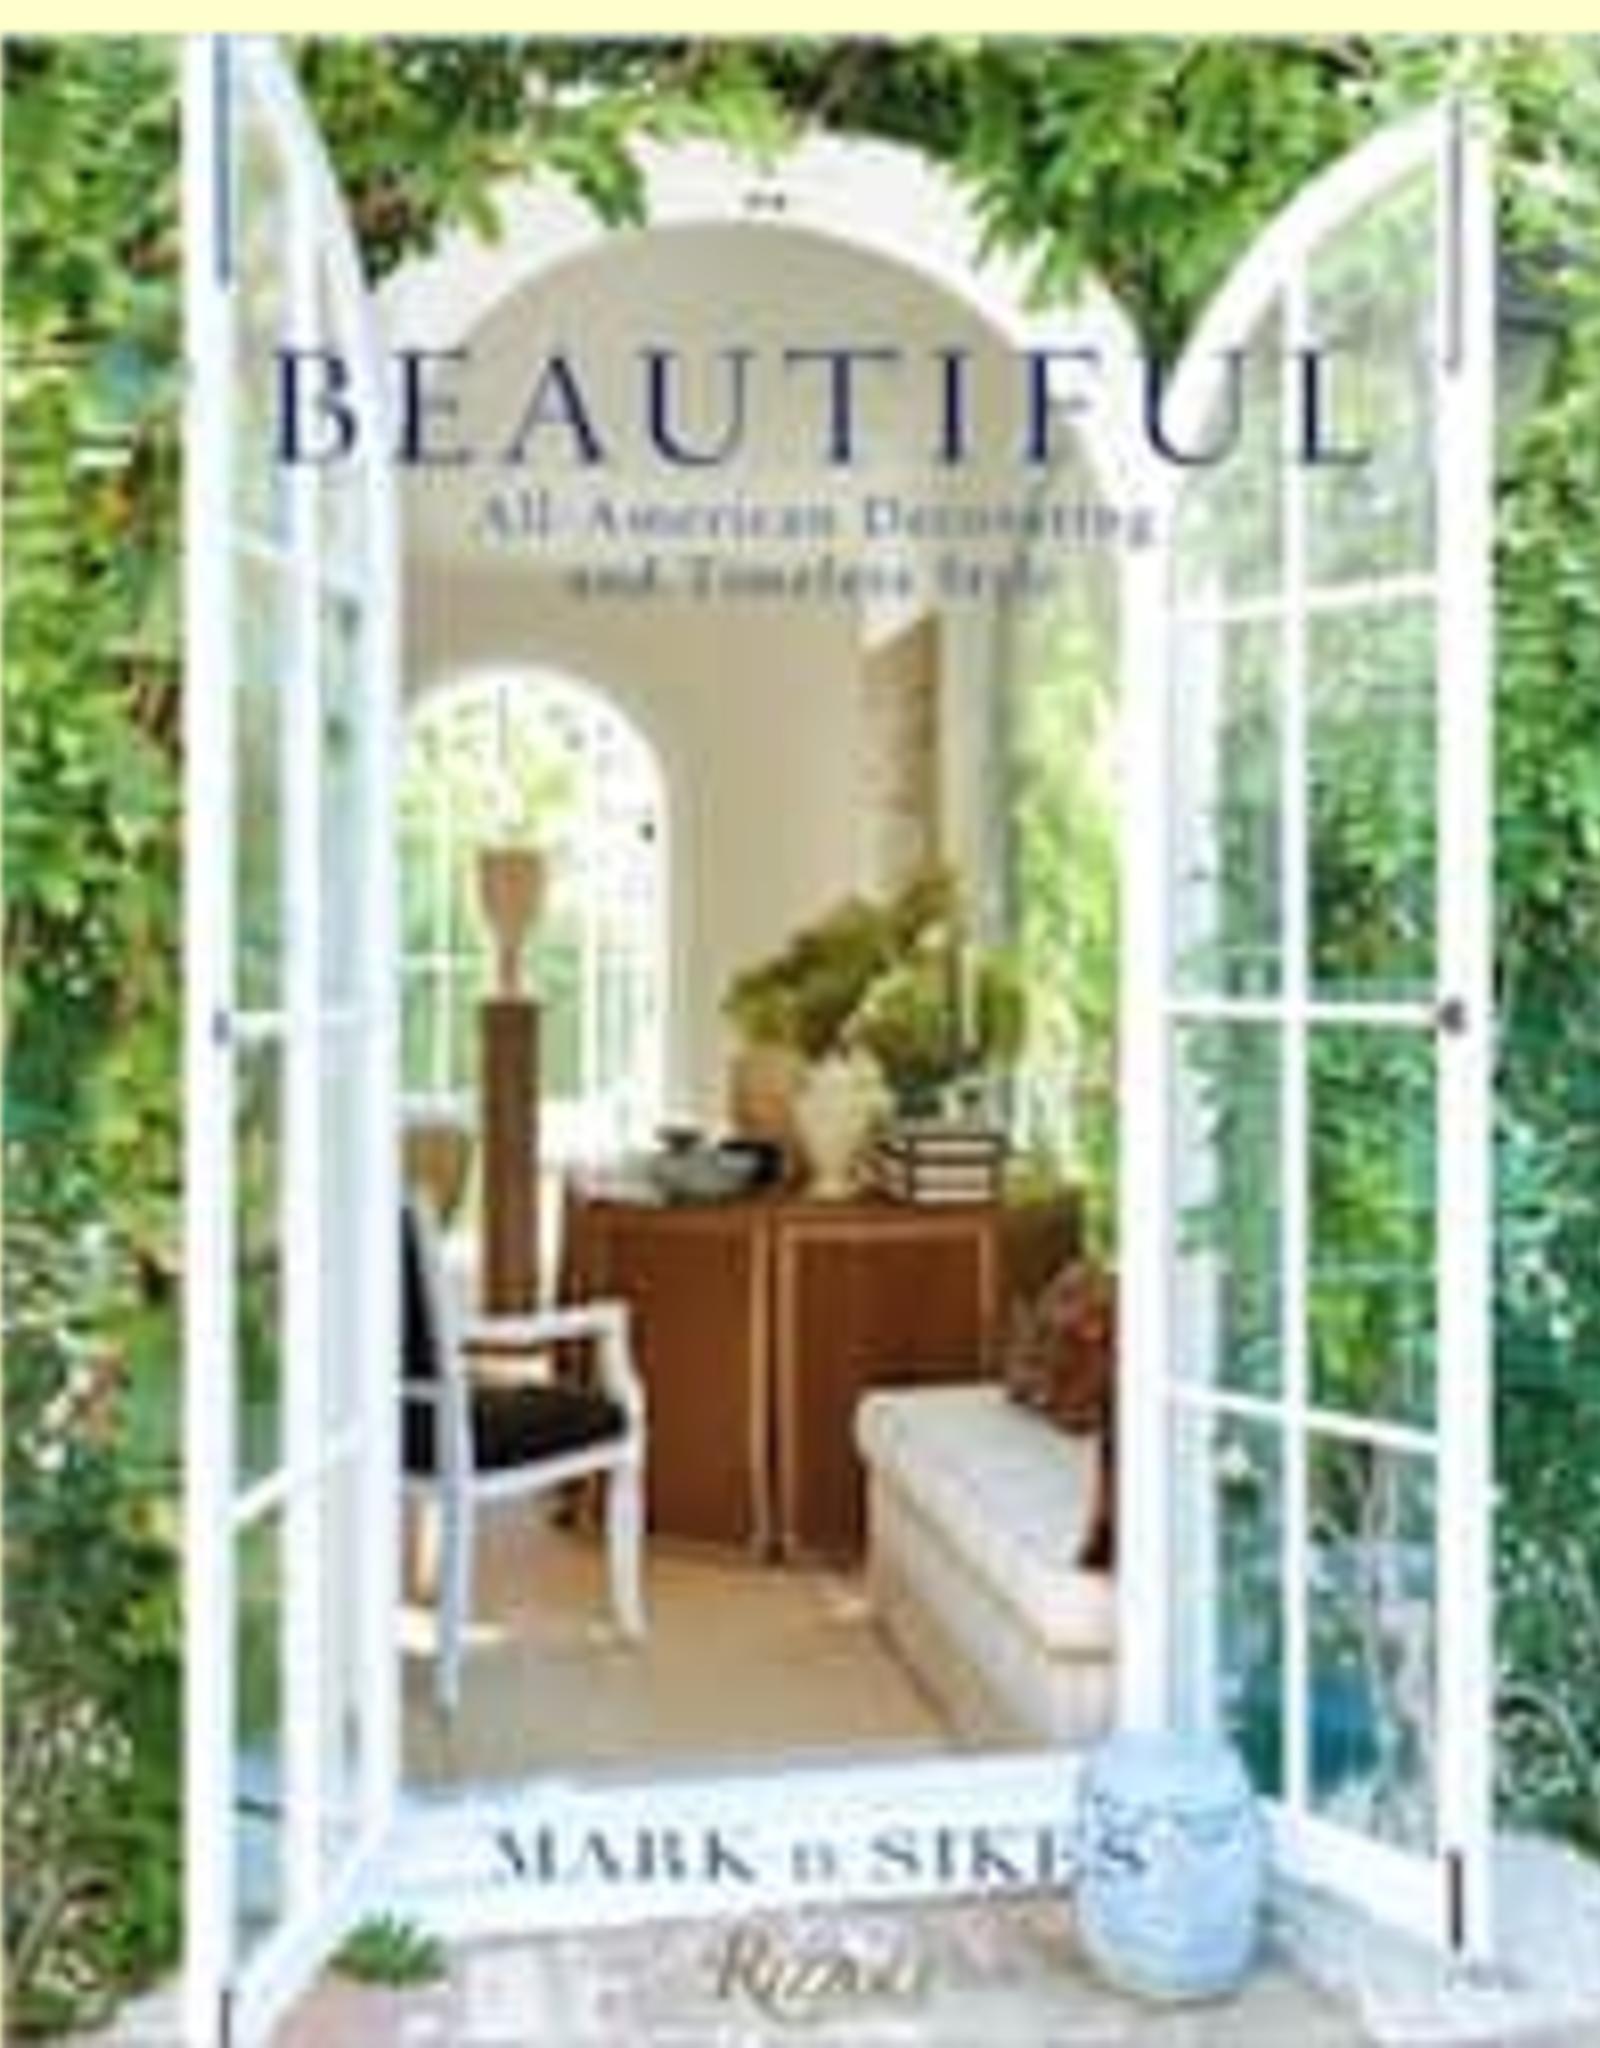 Website Beautiful:  All-American Decor